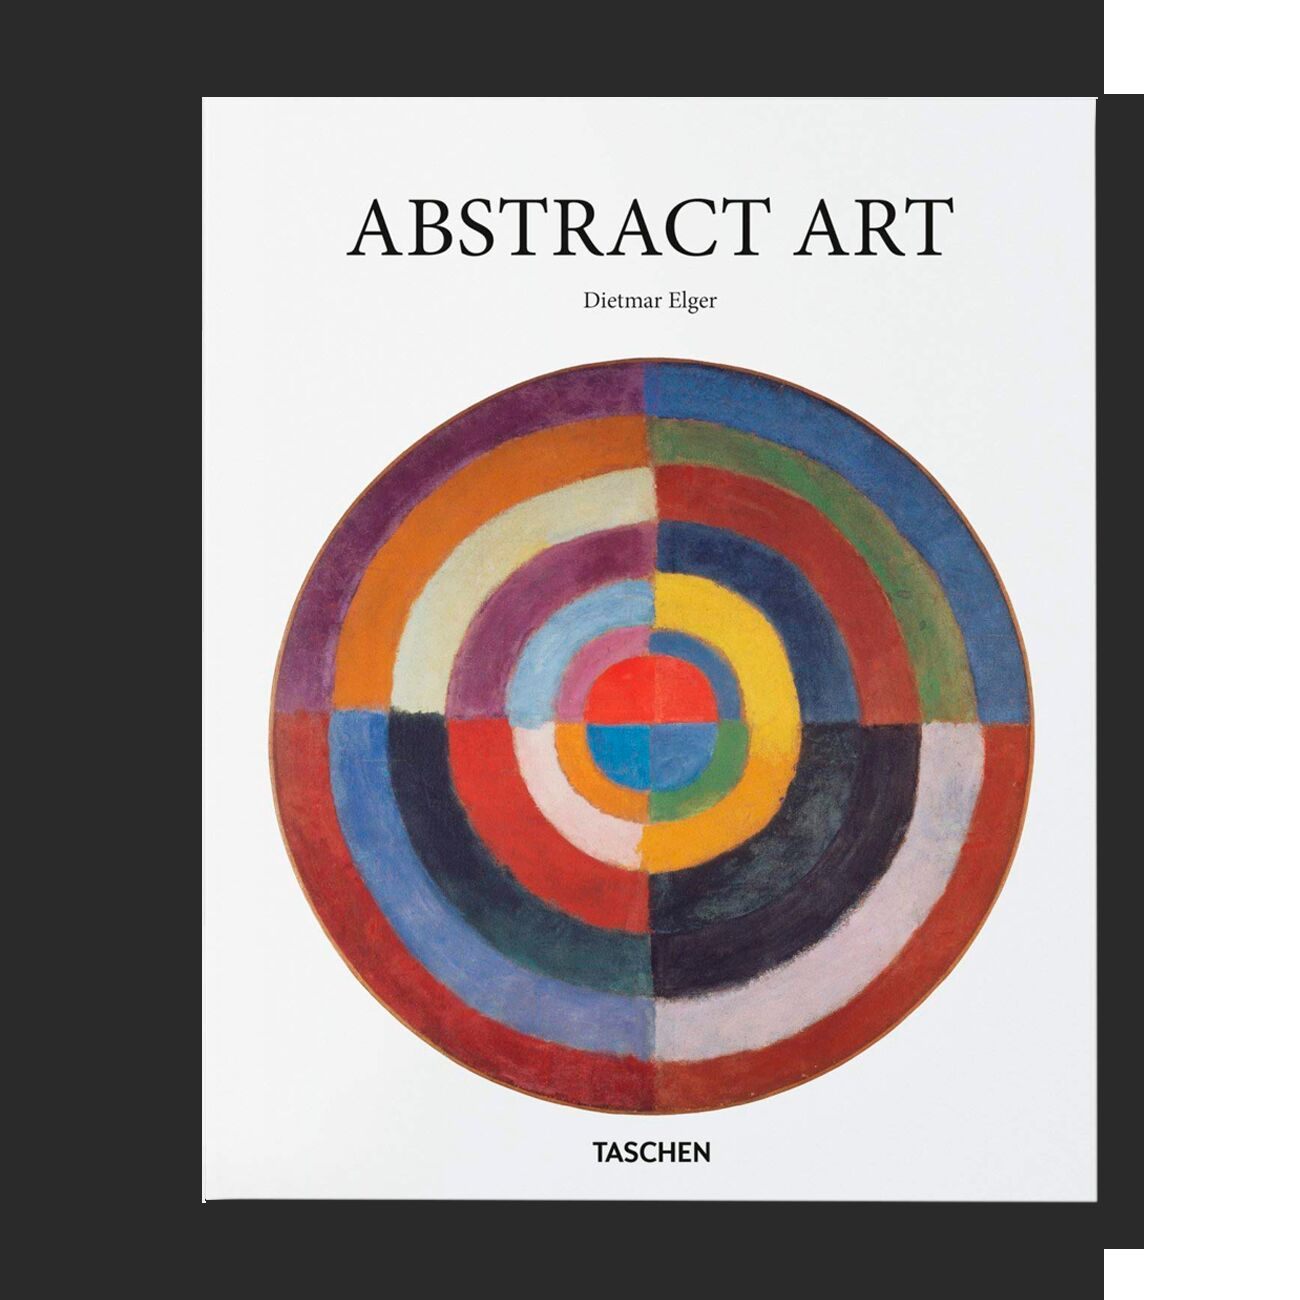 Abstract Art (Basic Art Series)